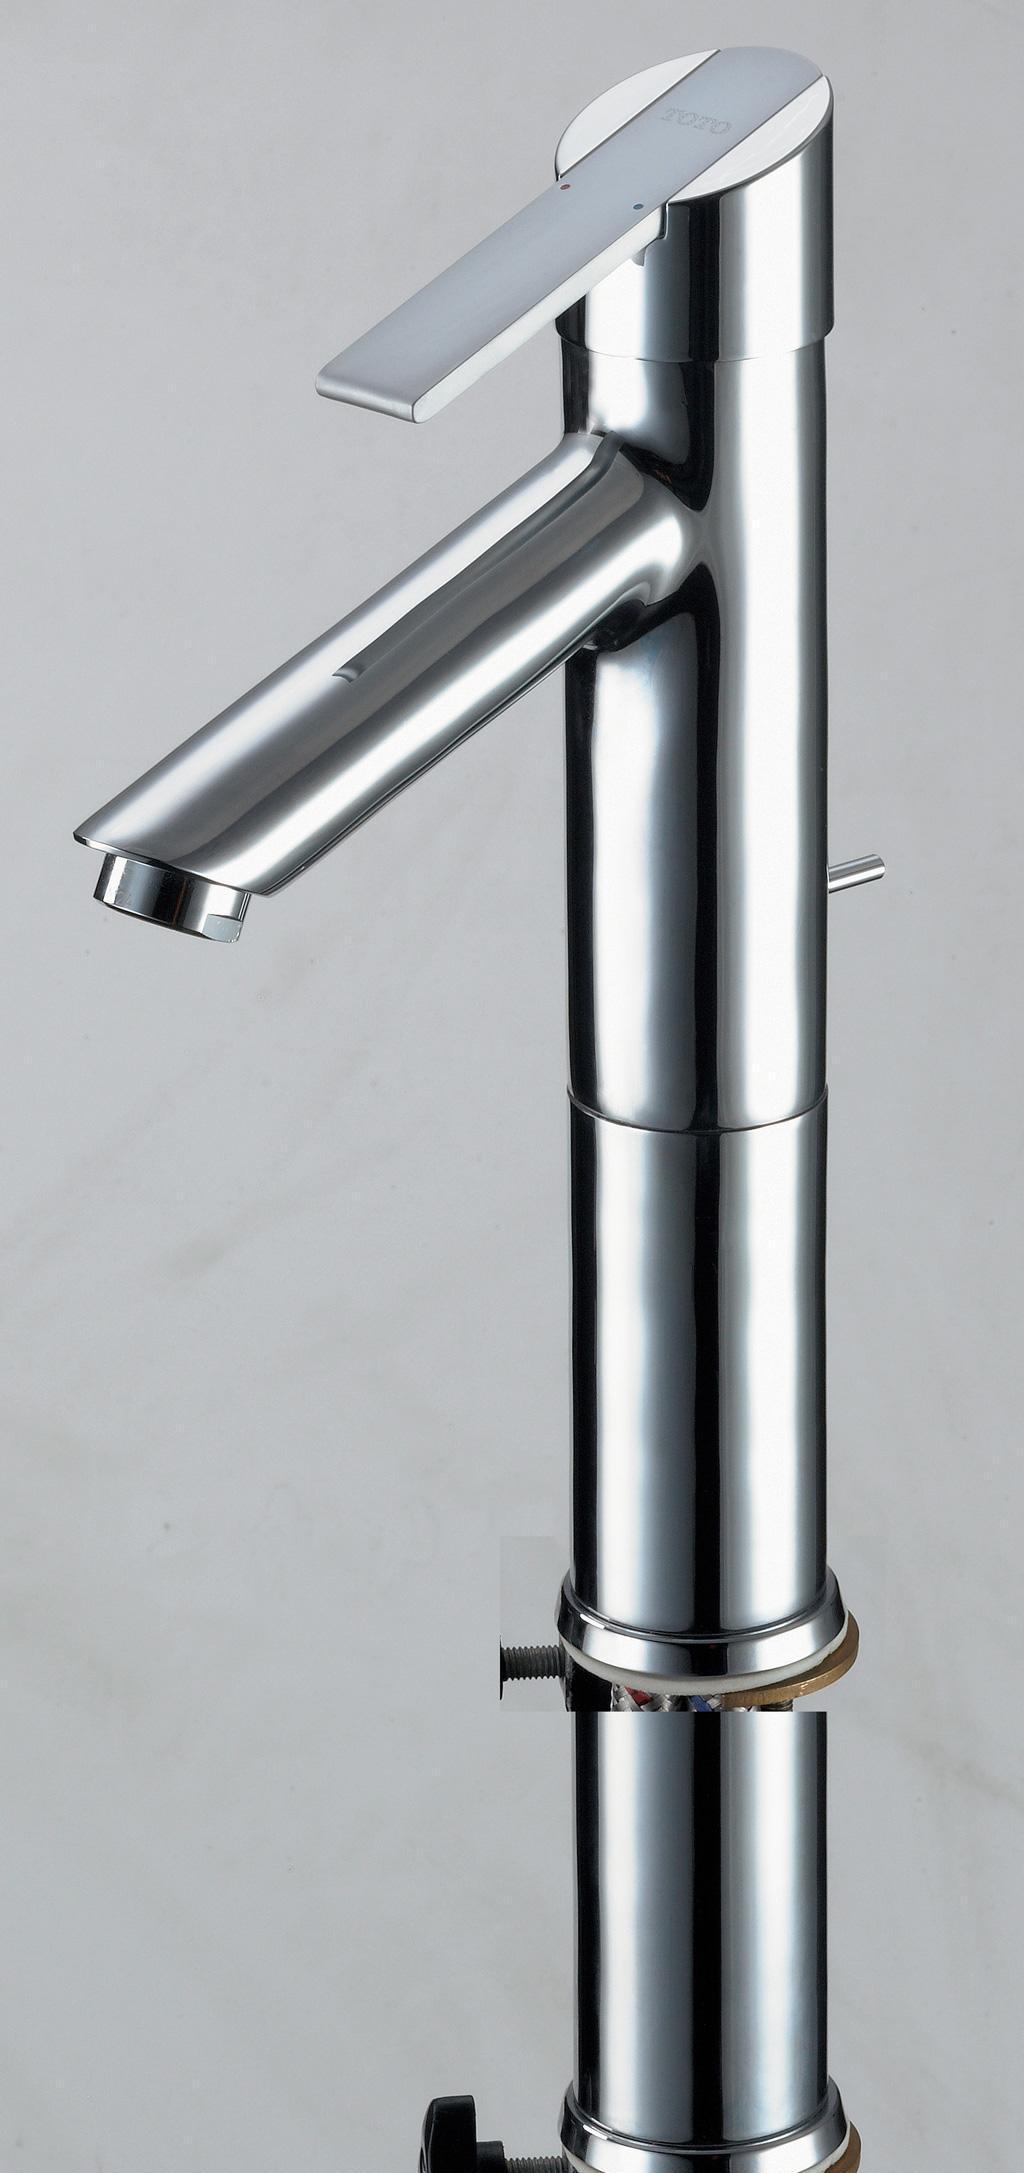 TOTO洗面盆用龙头DL320B1DL320B1